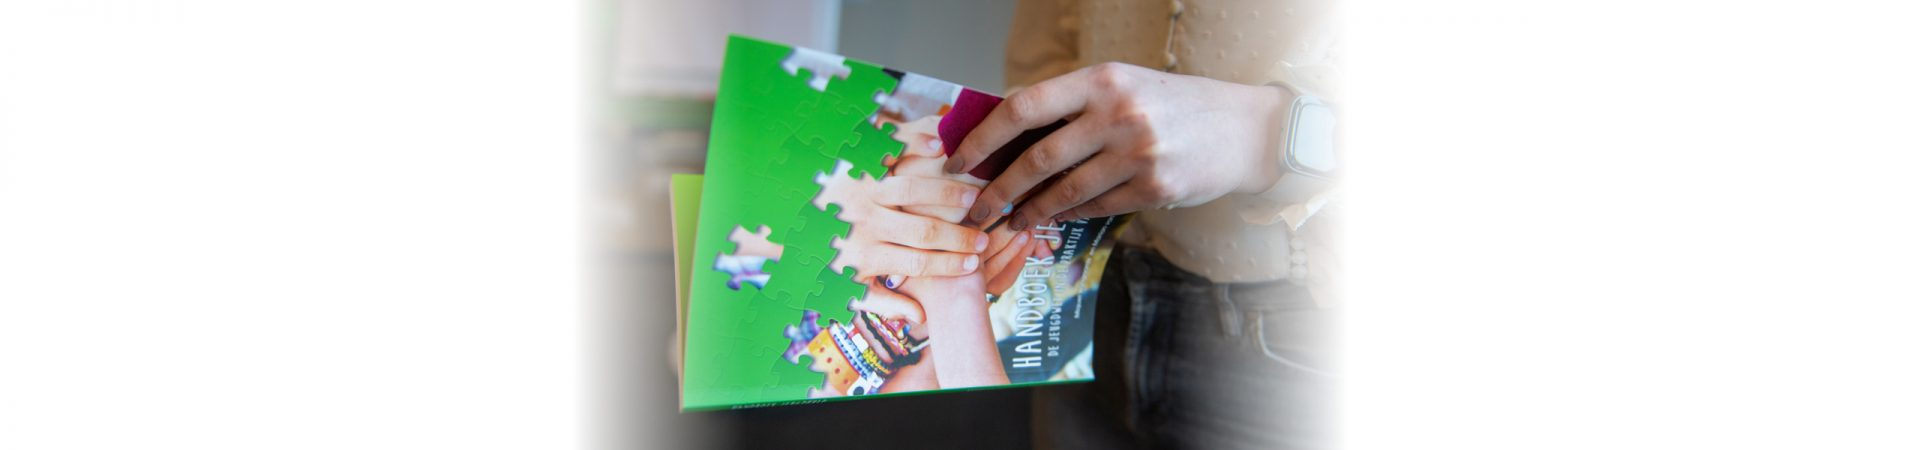 Handboek Jeugdhulp en Handboek WMO